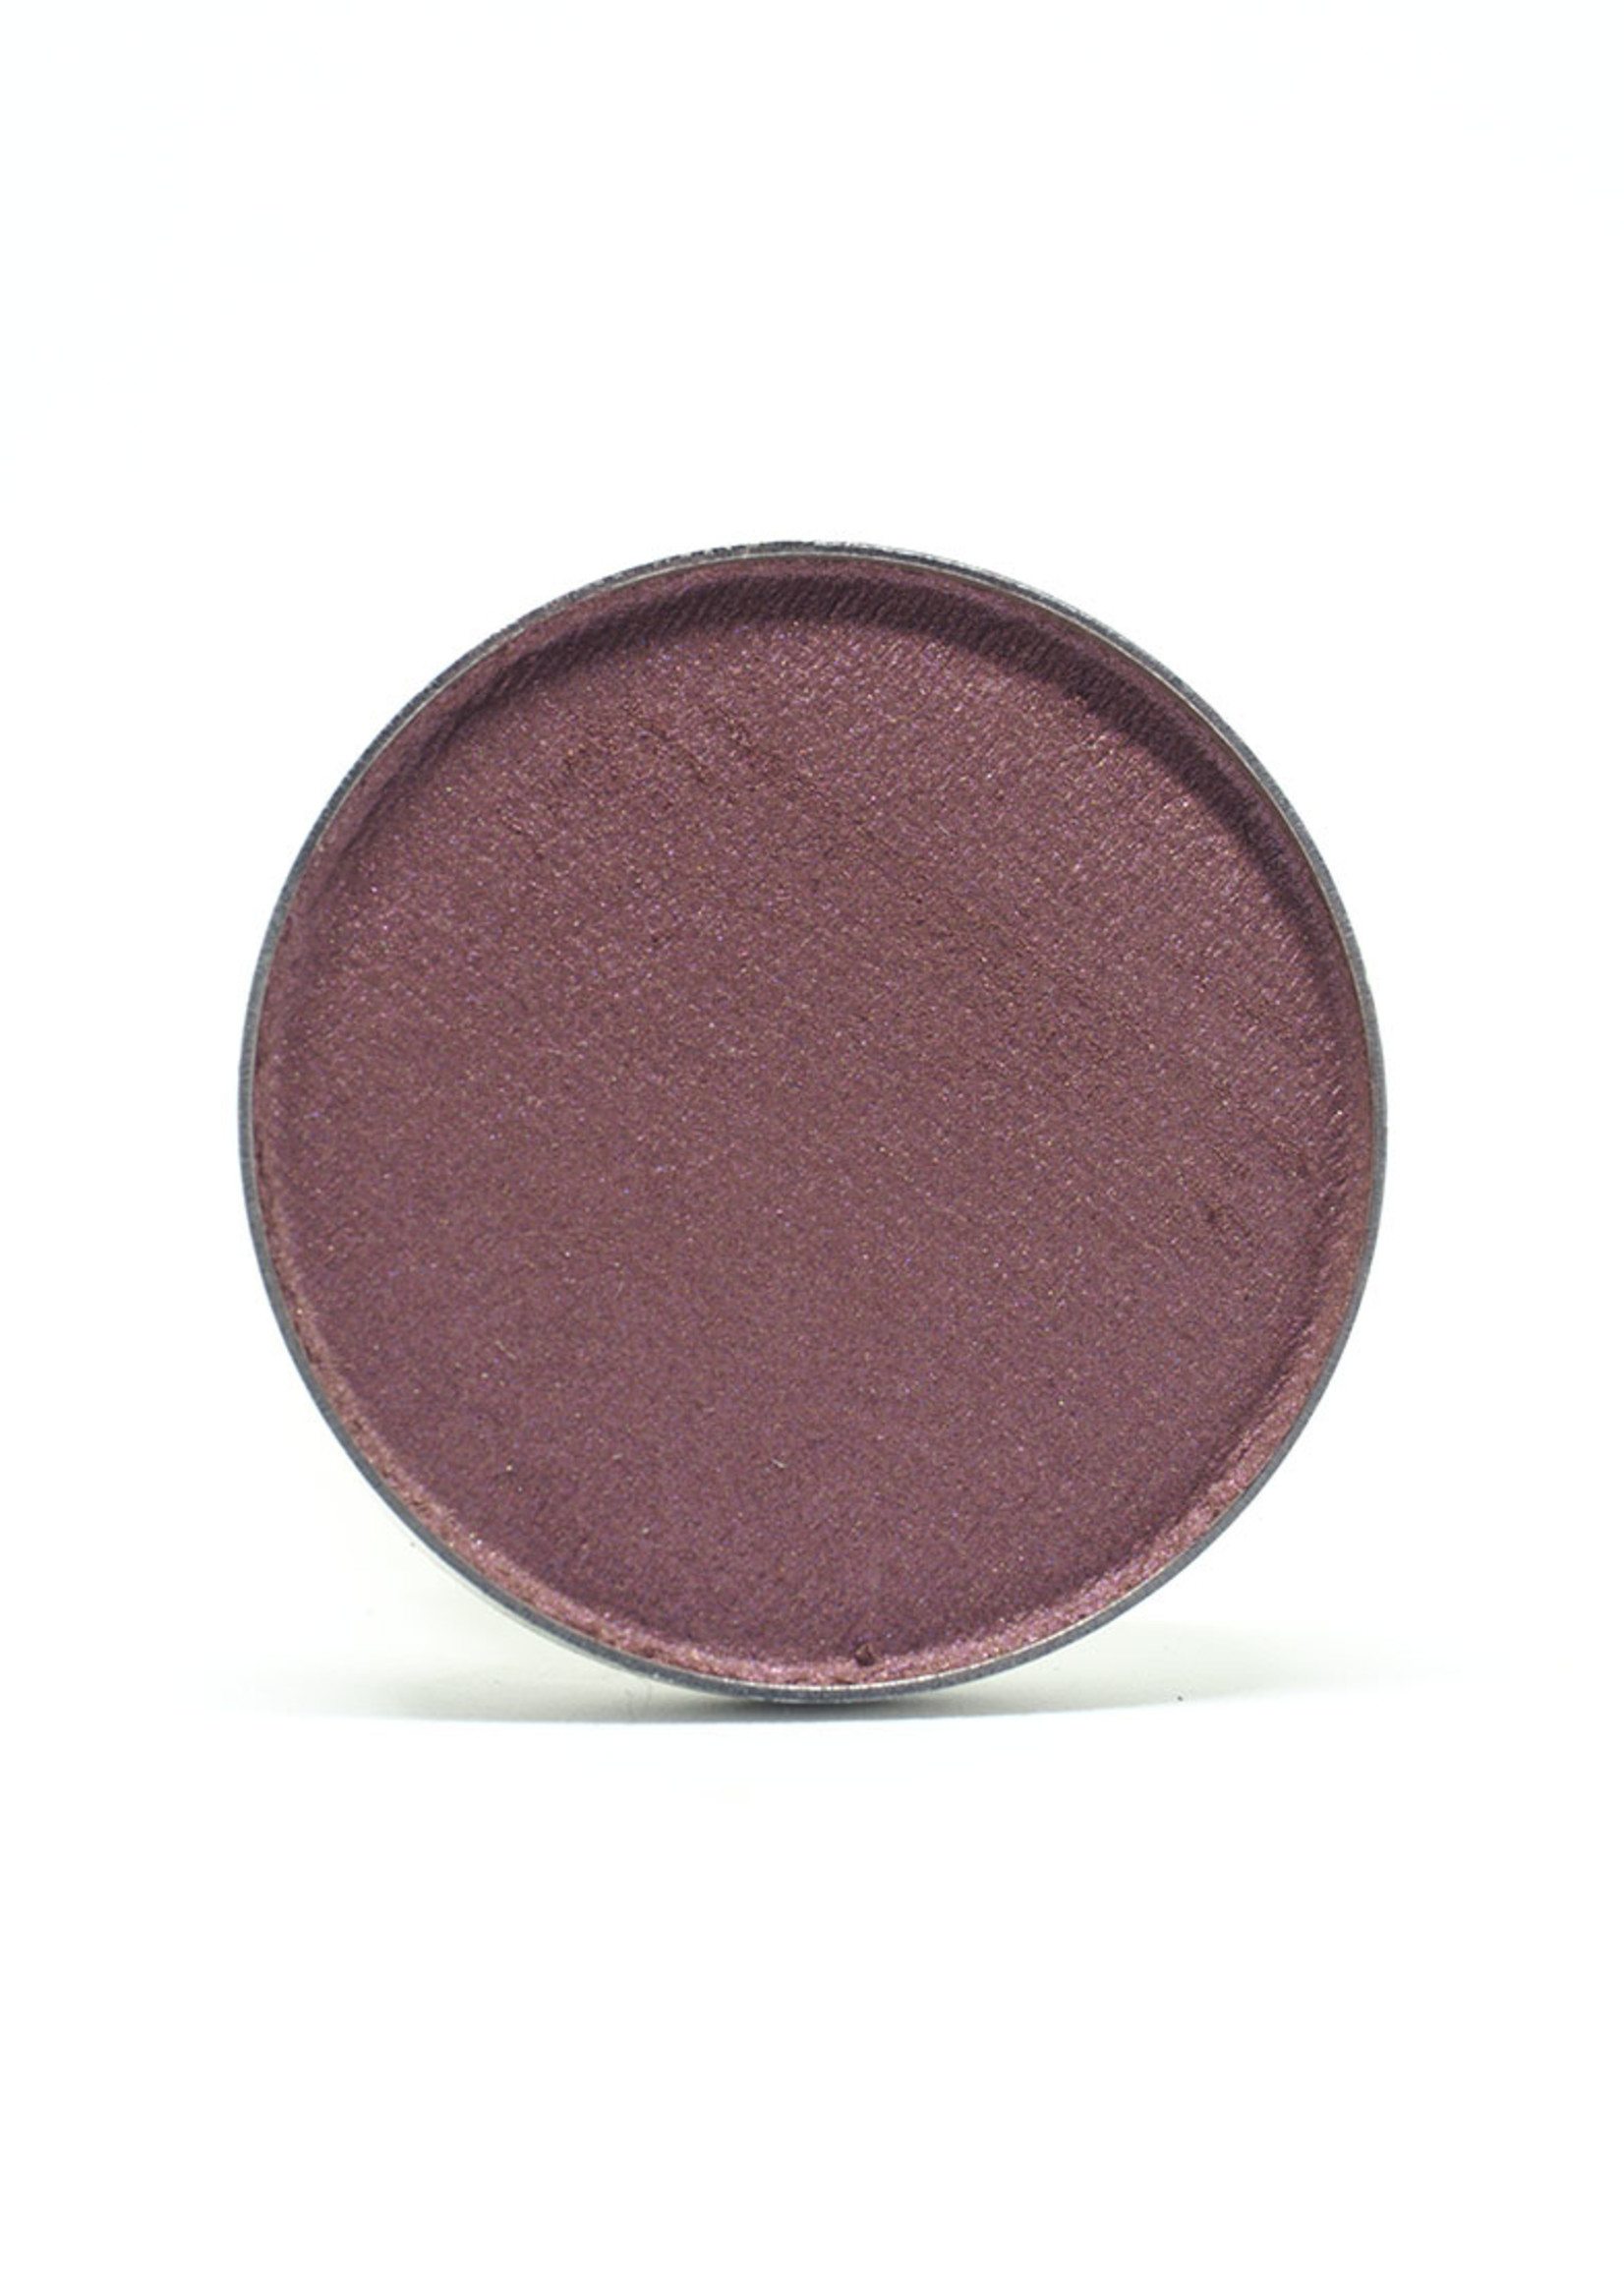 Elate Create Eye Colour: Modish